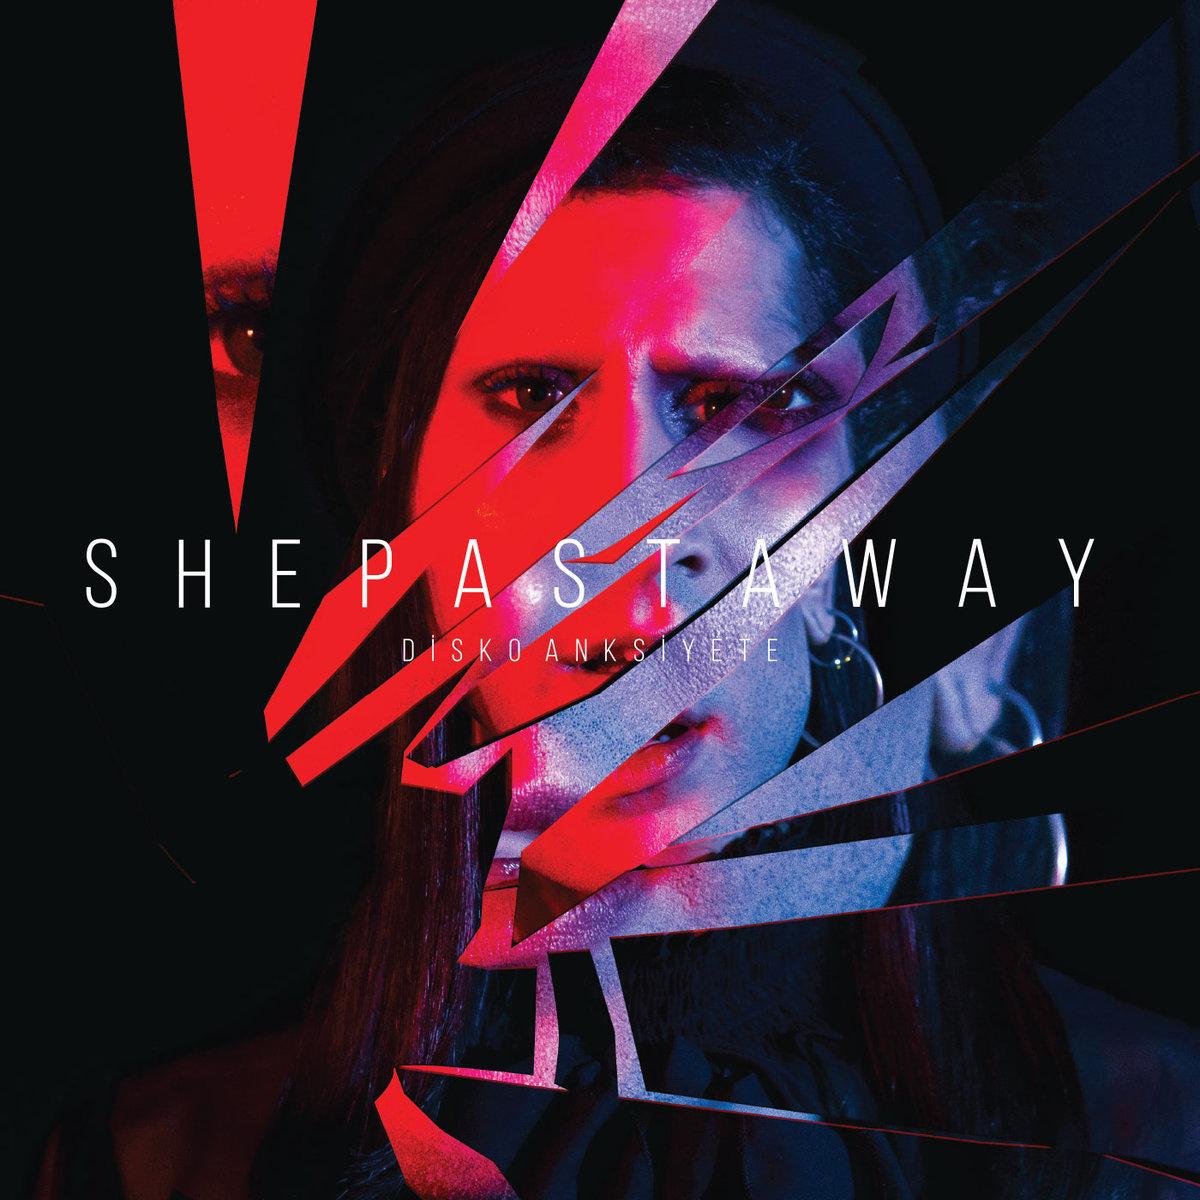 She Past Away - Disko Anksiyete (LP; 2019)